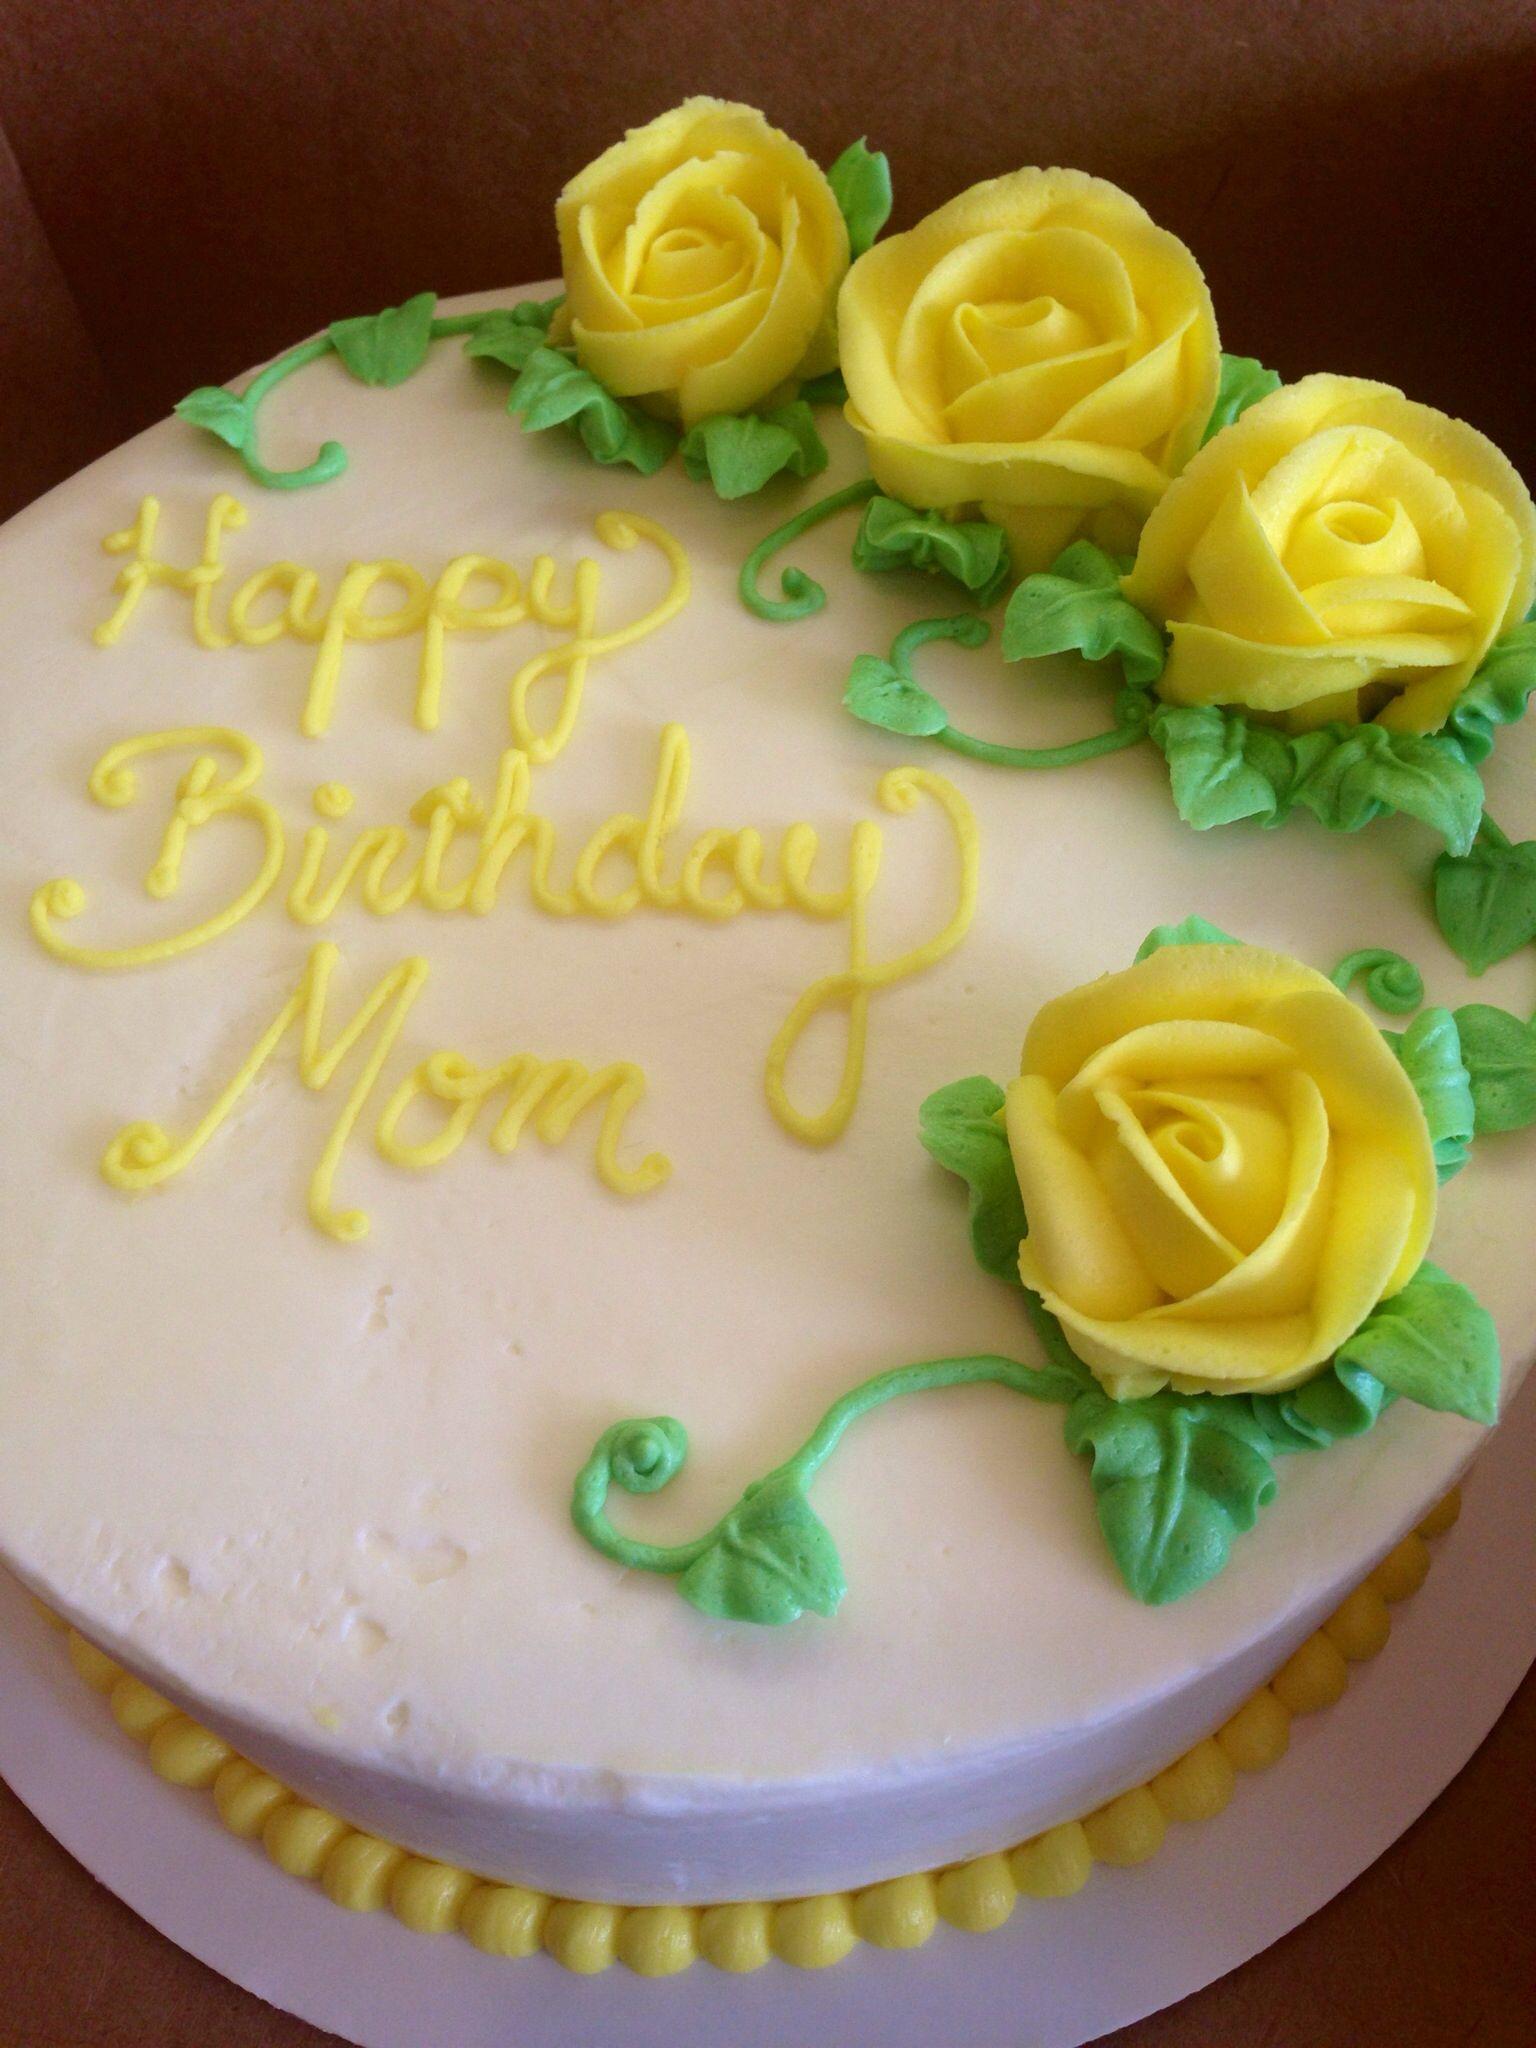 Pin By Wendy Schay On Cakes I Ve Made W Schay Happy Birthday Cakes For Women Happy Birthday Mom Cake Fondant Cakes Birthday